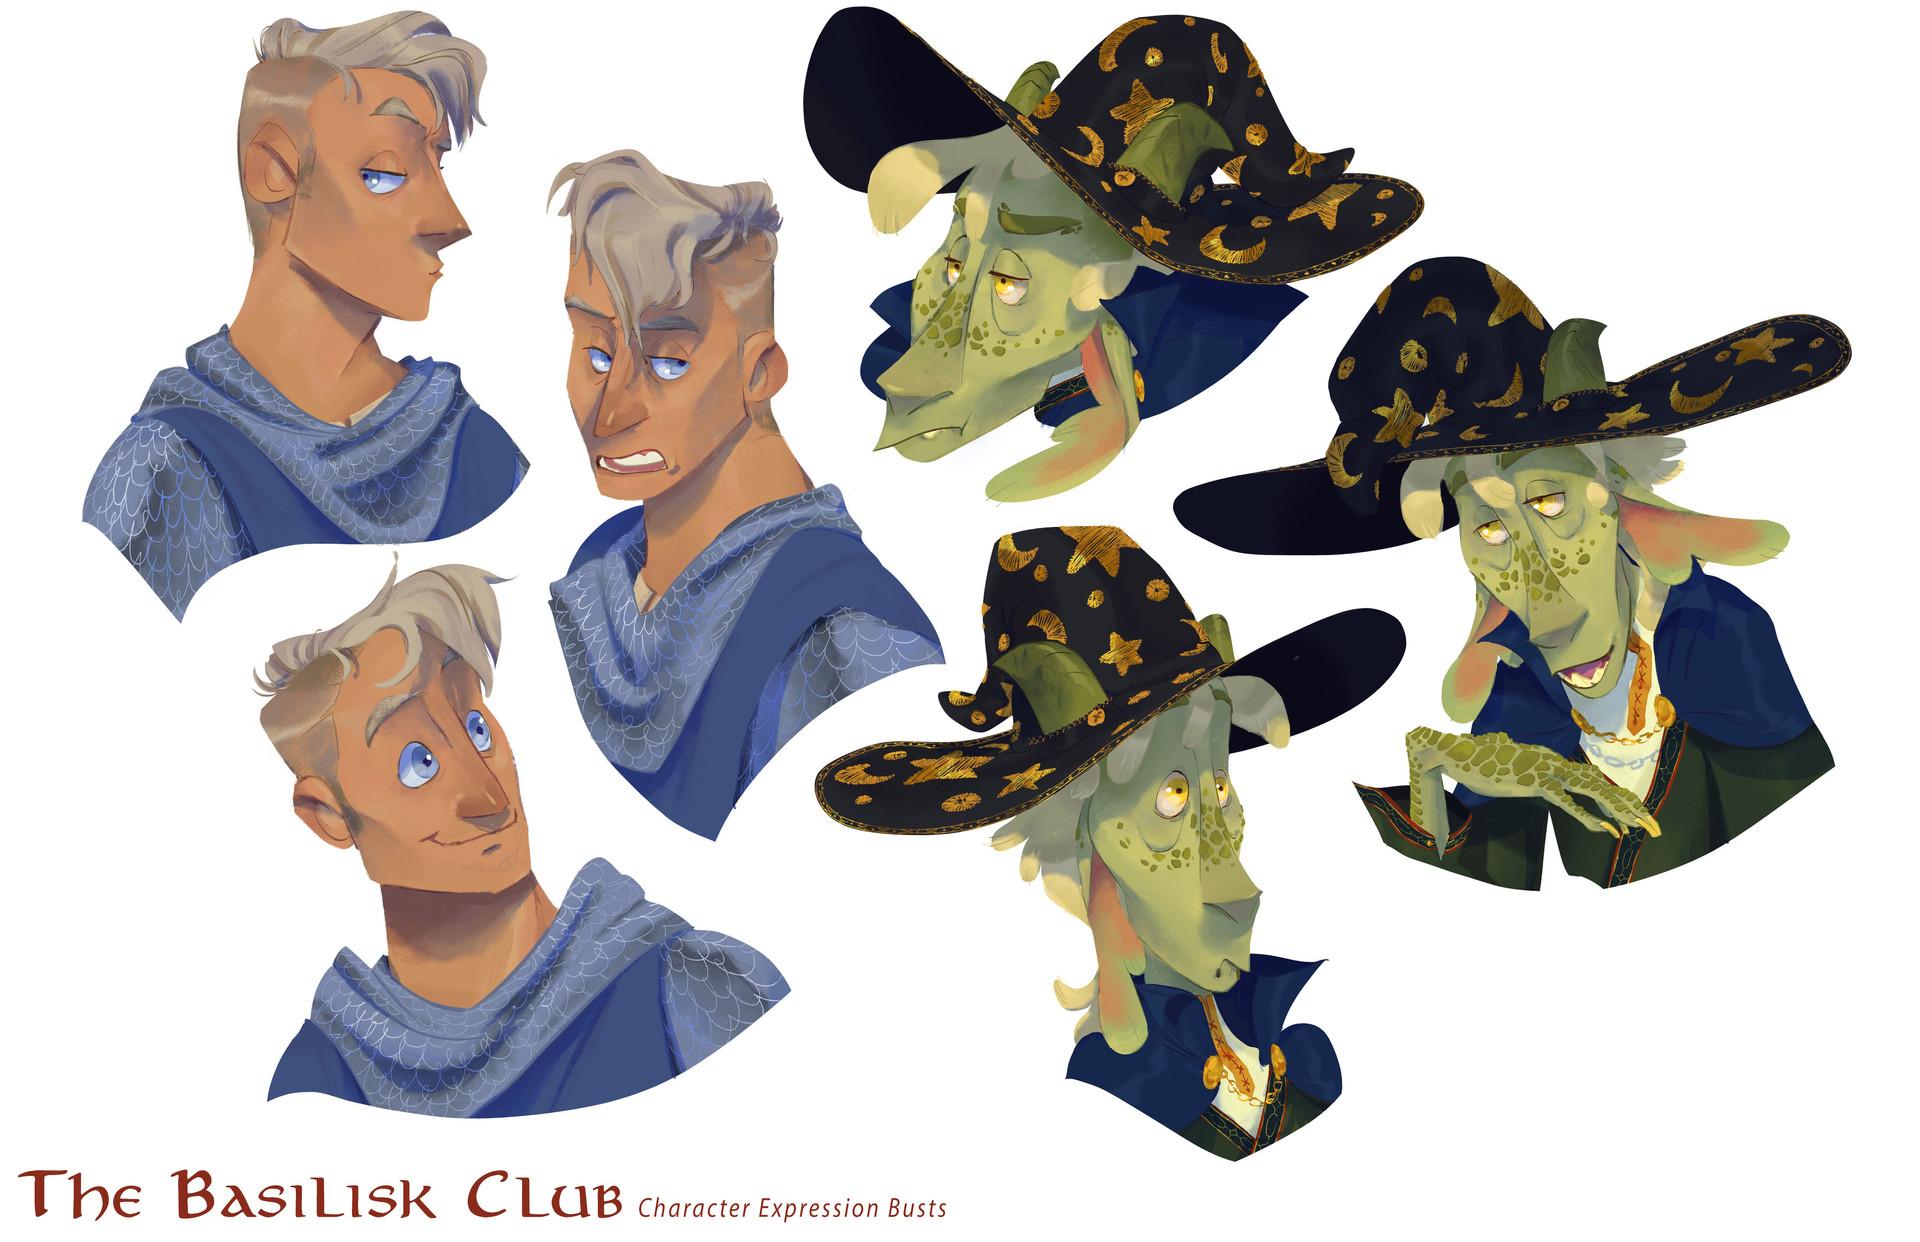 The Basilisk Club: Character Busts